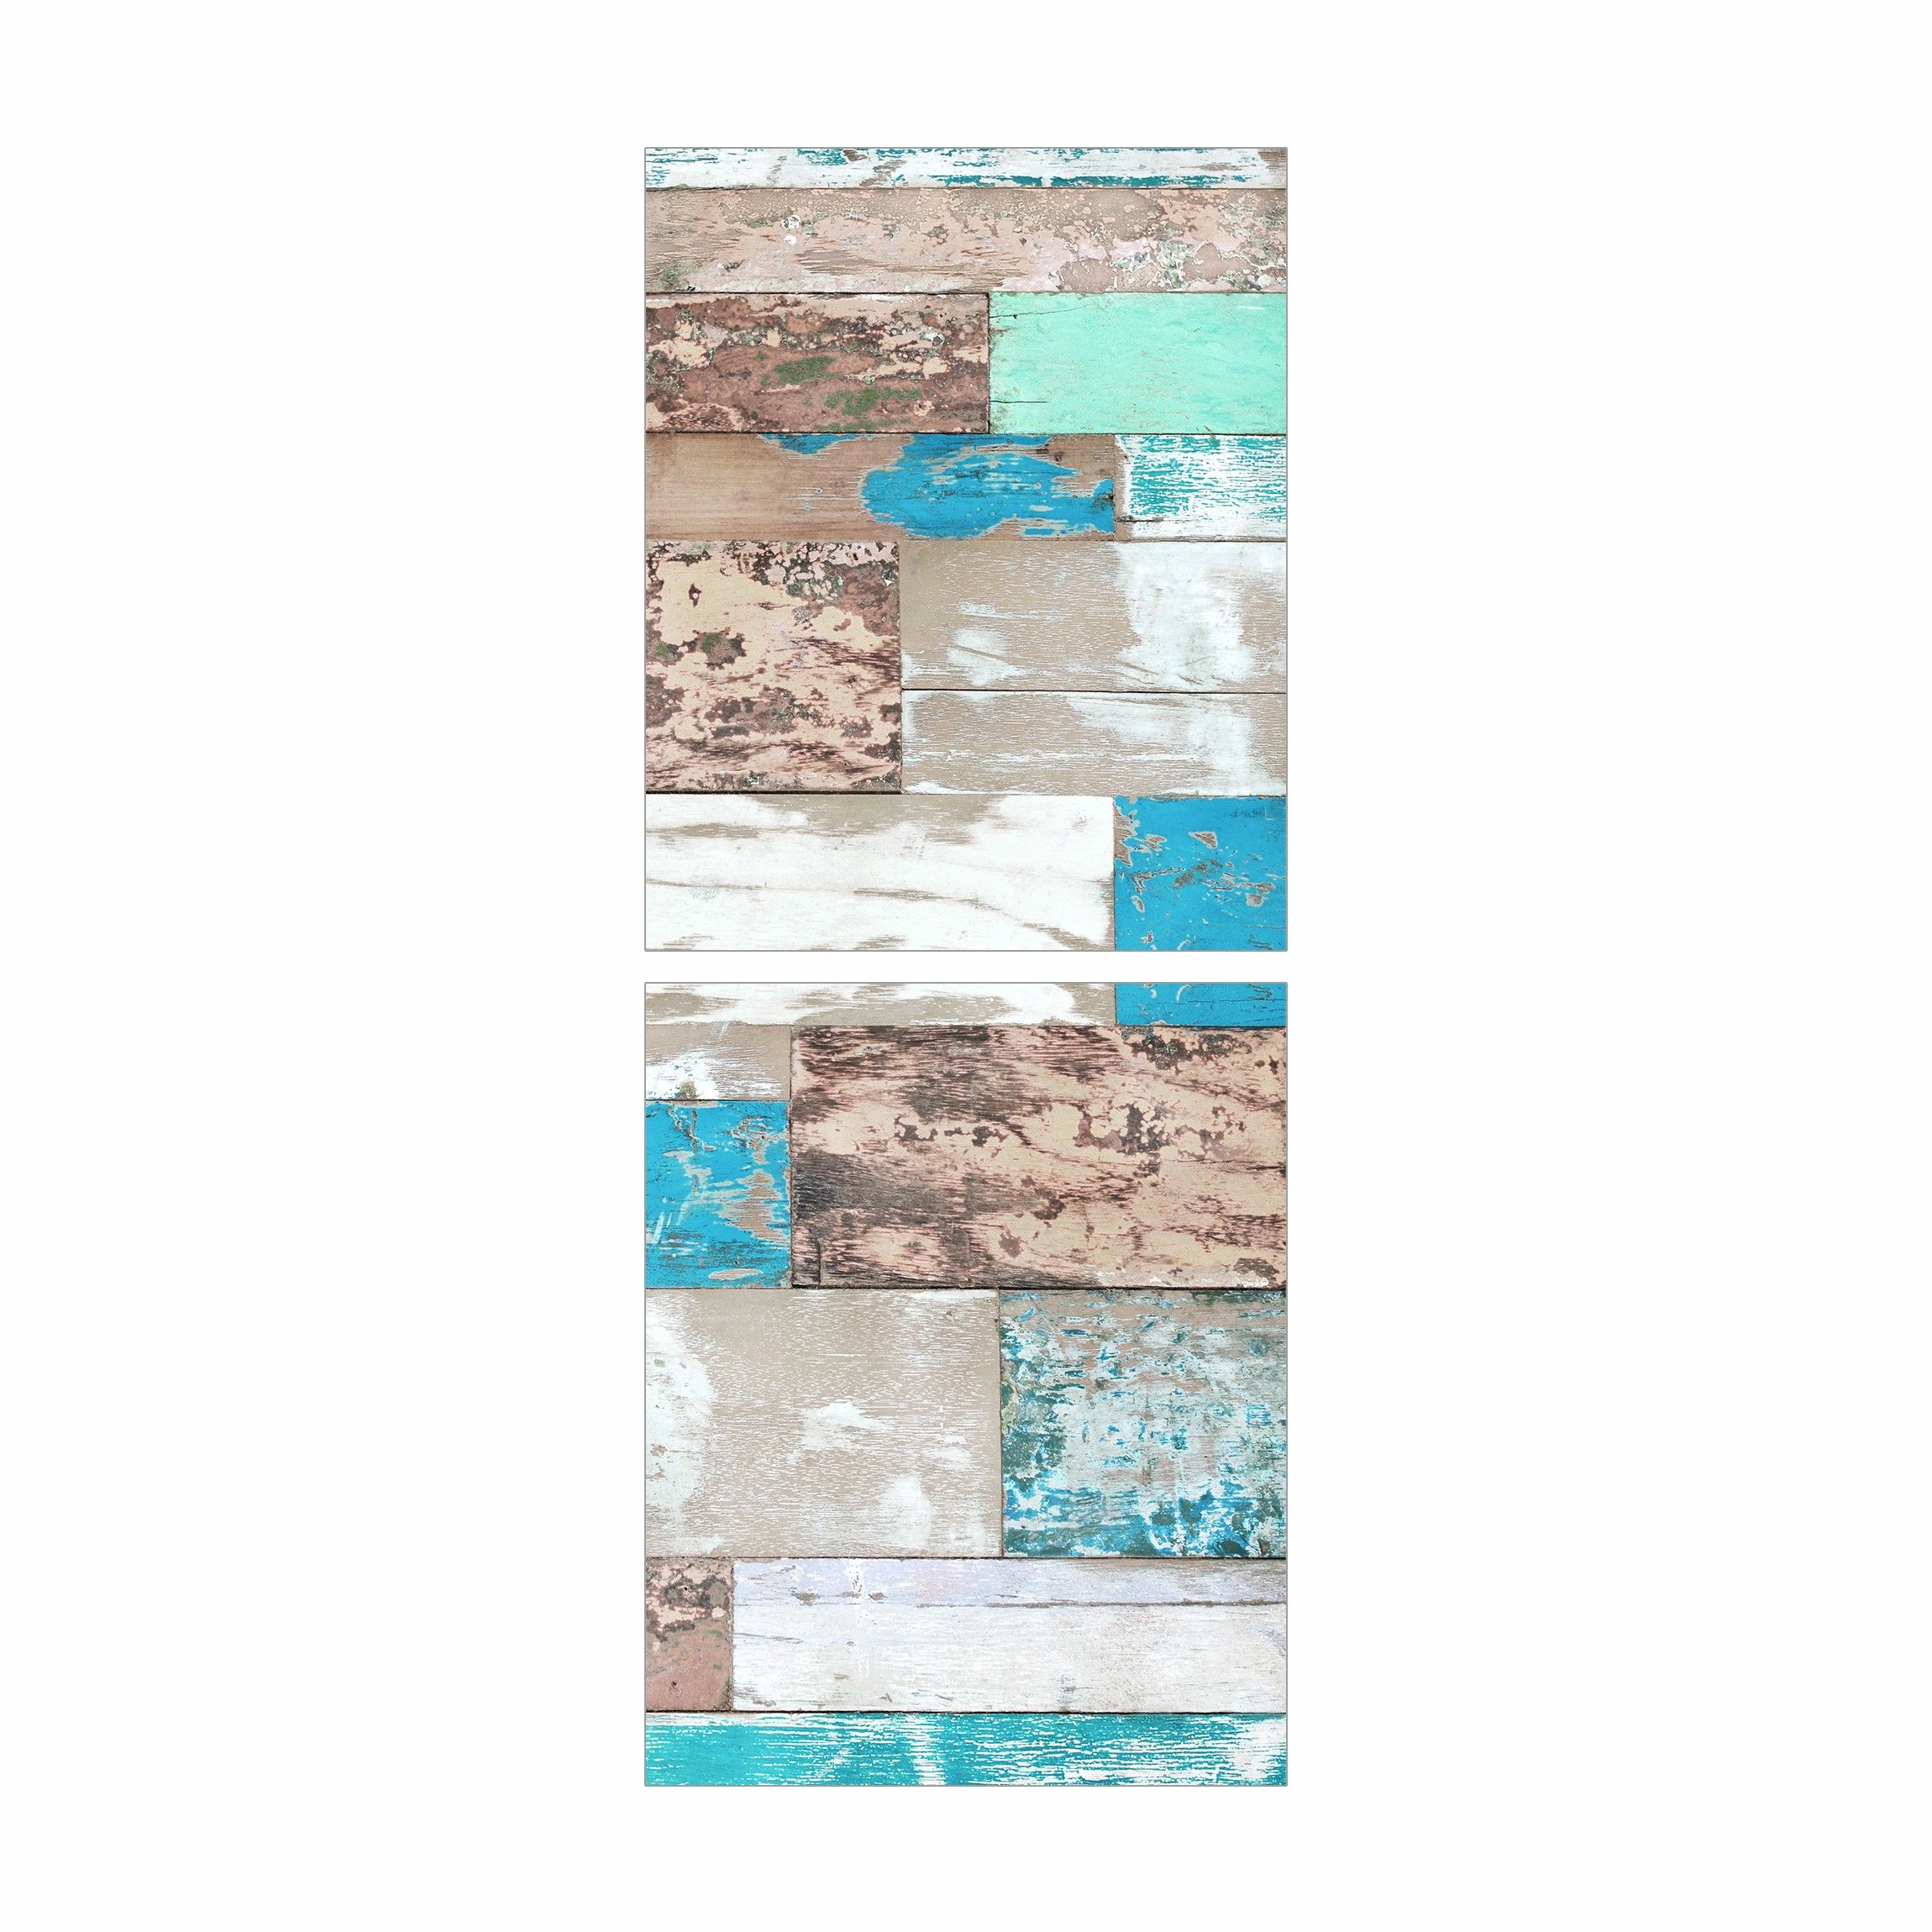 Ikea Klebefolie möbelfolie für ikea billy regal klebefolie maritime planks